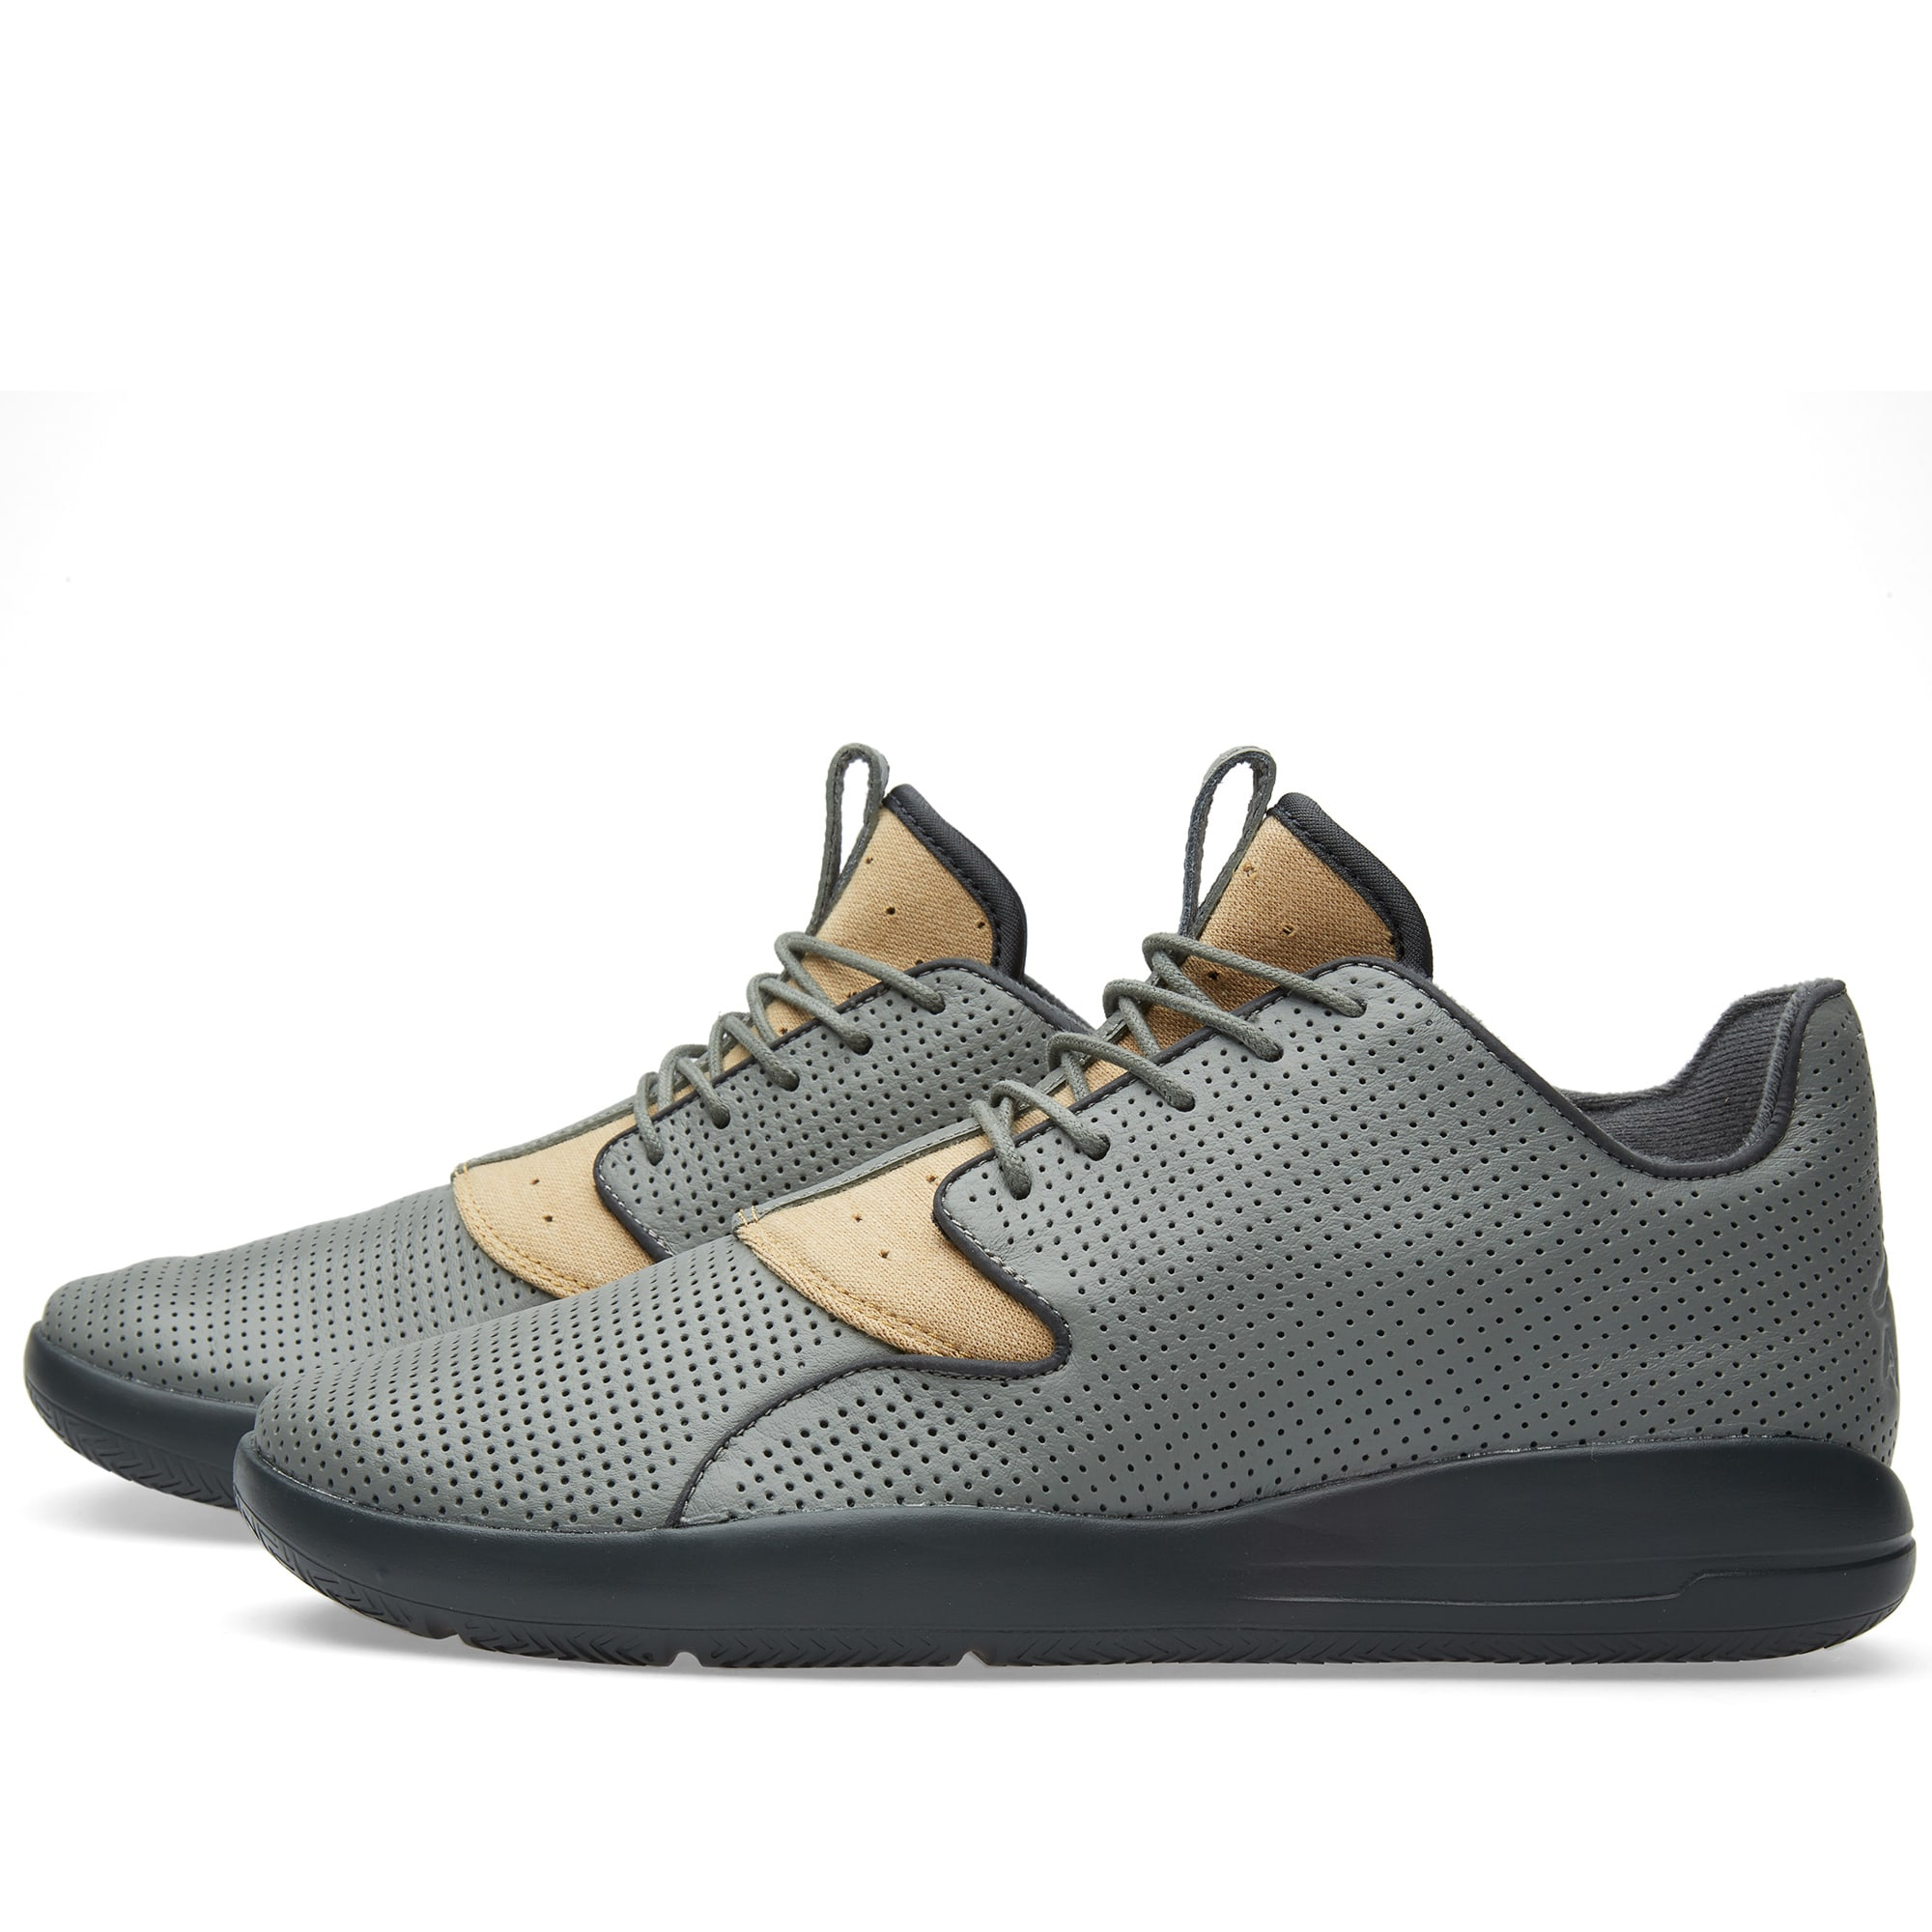 305c9be83bd6 Nike Jordan Eclipse Leather  Berlin  Tumbled Grey   Cinnabar